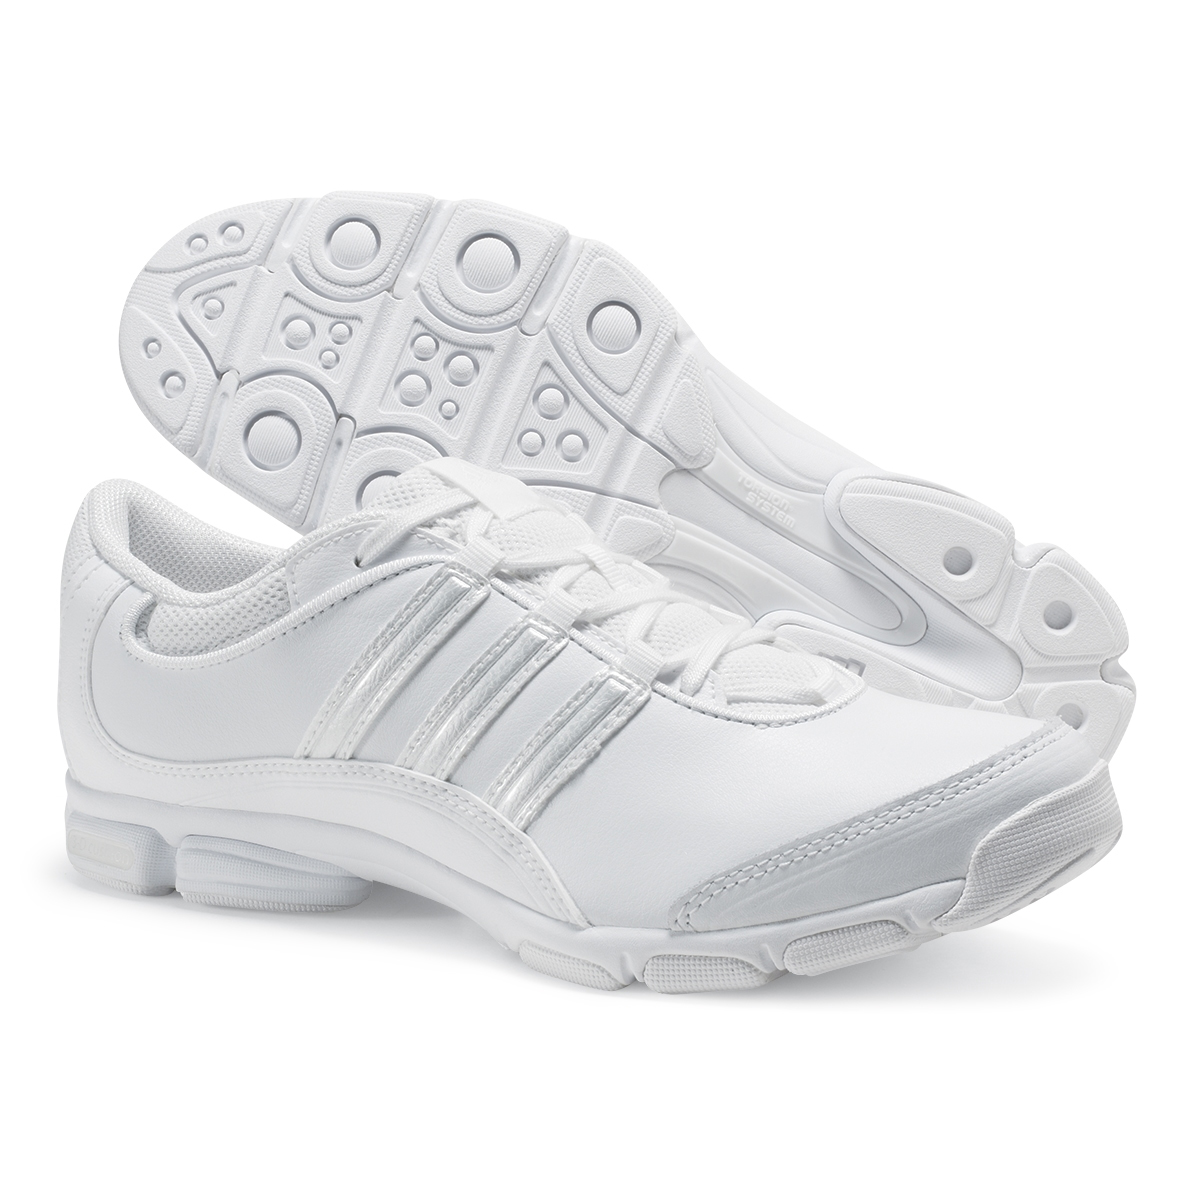 Adidas Cheer Sport Cheer Shoe